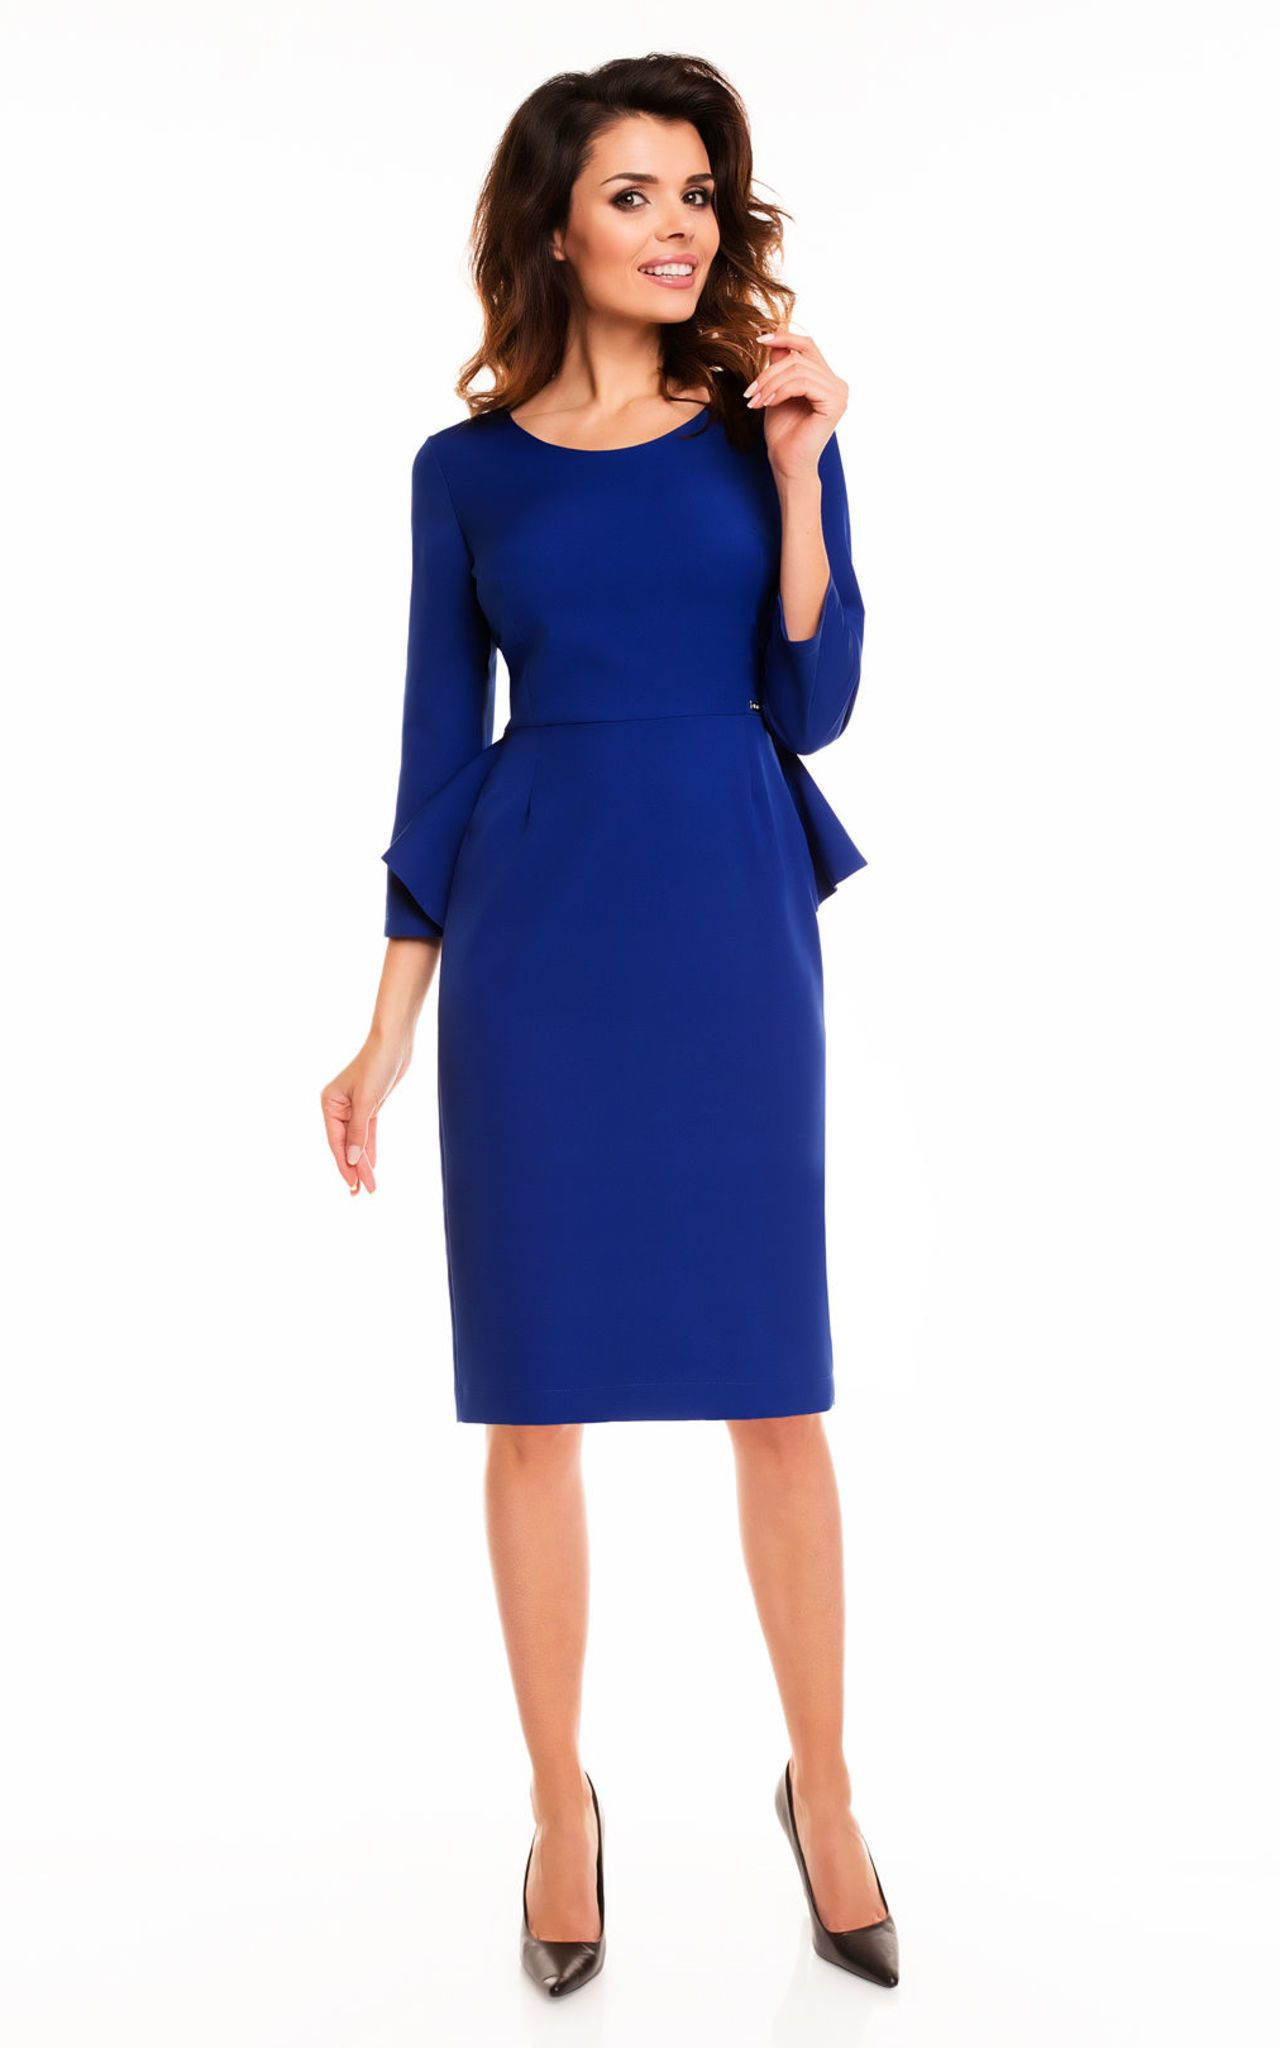 d339c5acfa649 Blue 3 4 Sleeve Back Frill Midi Dress - SilkFred